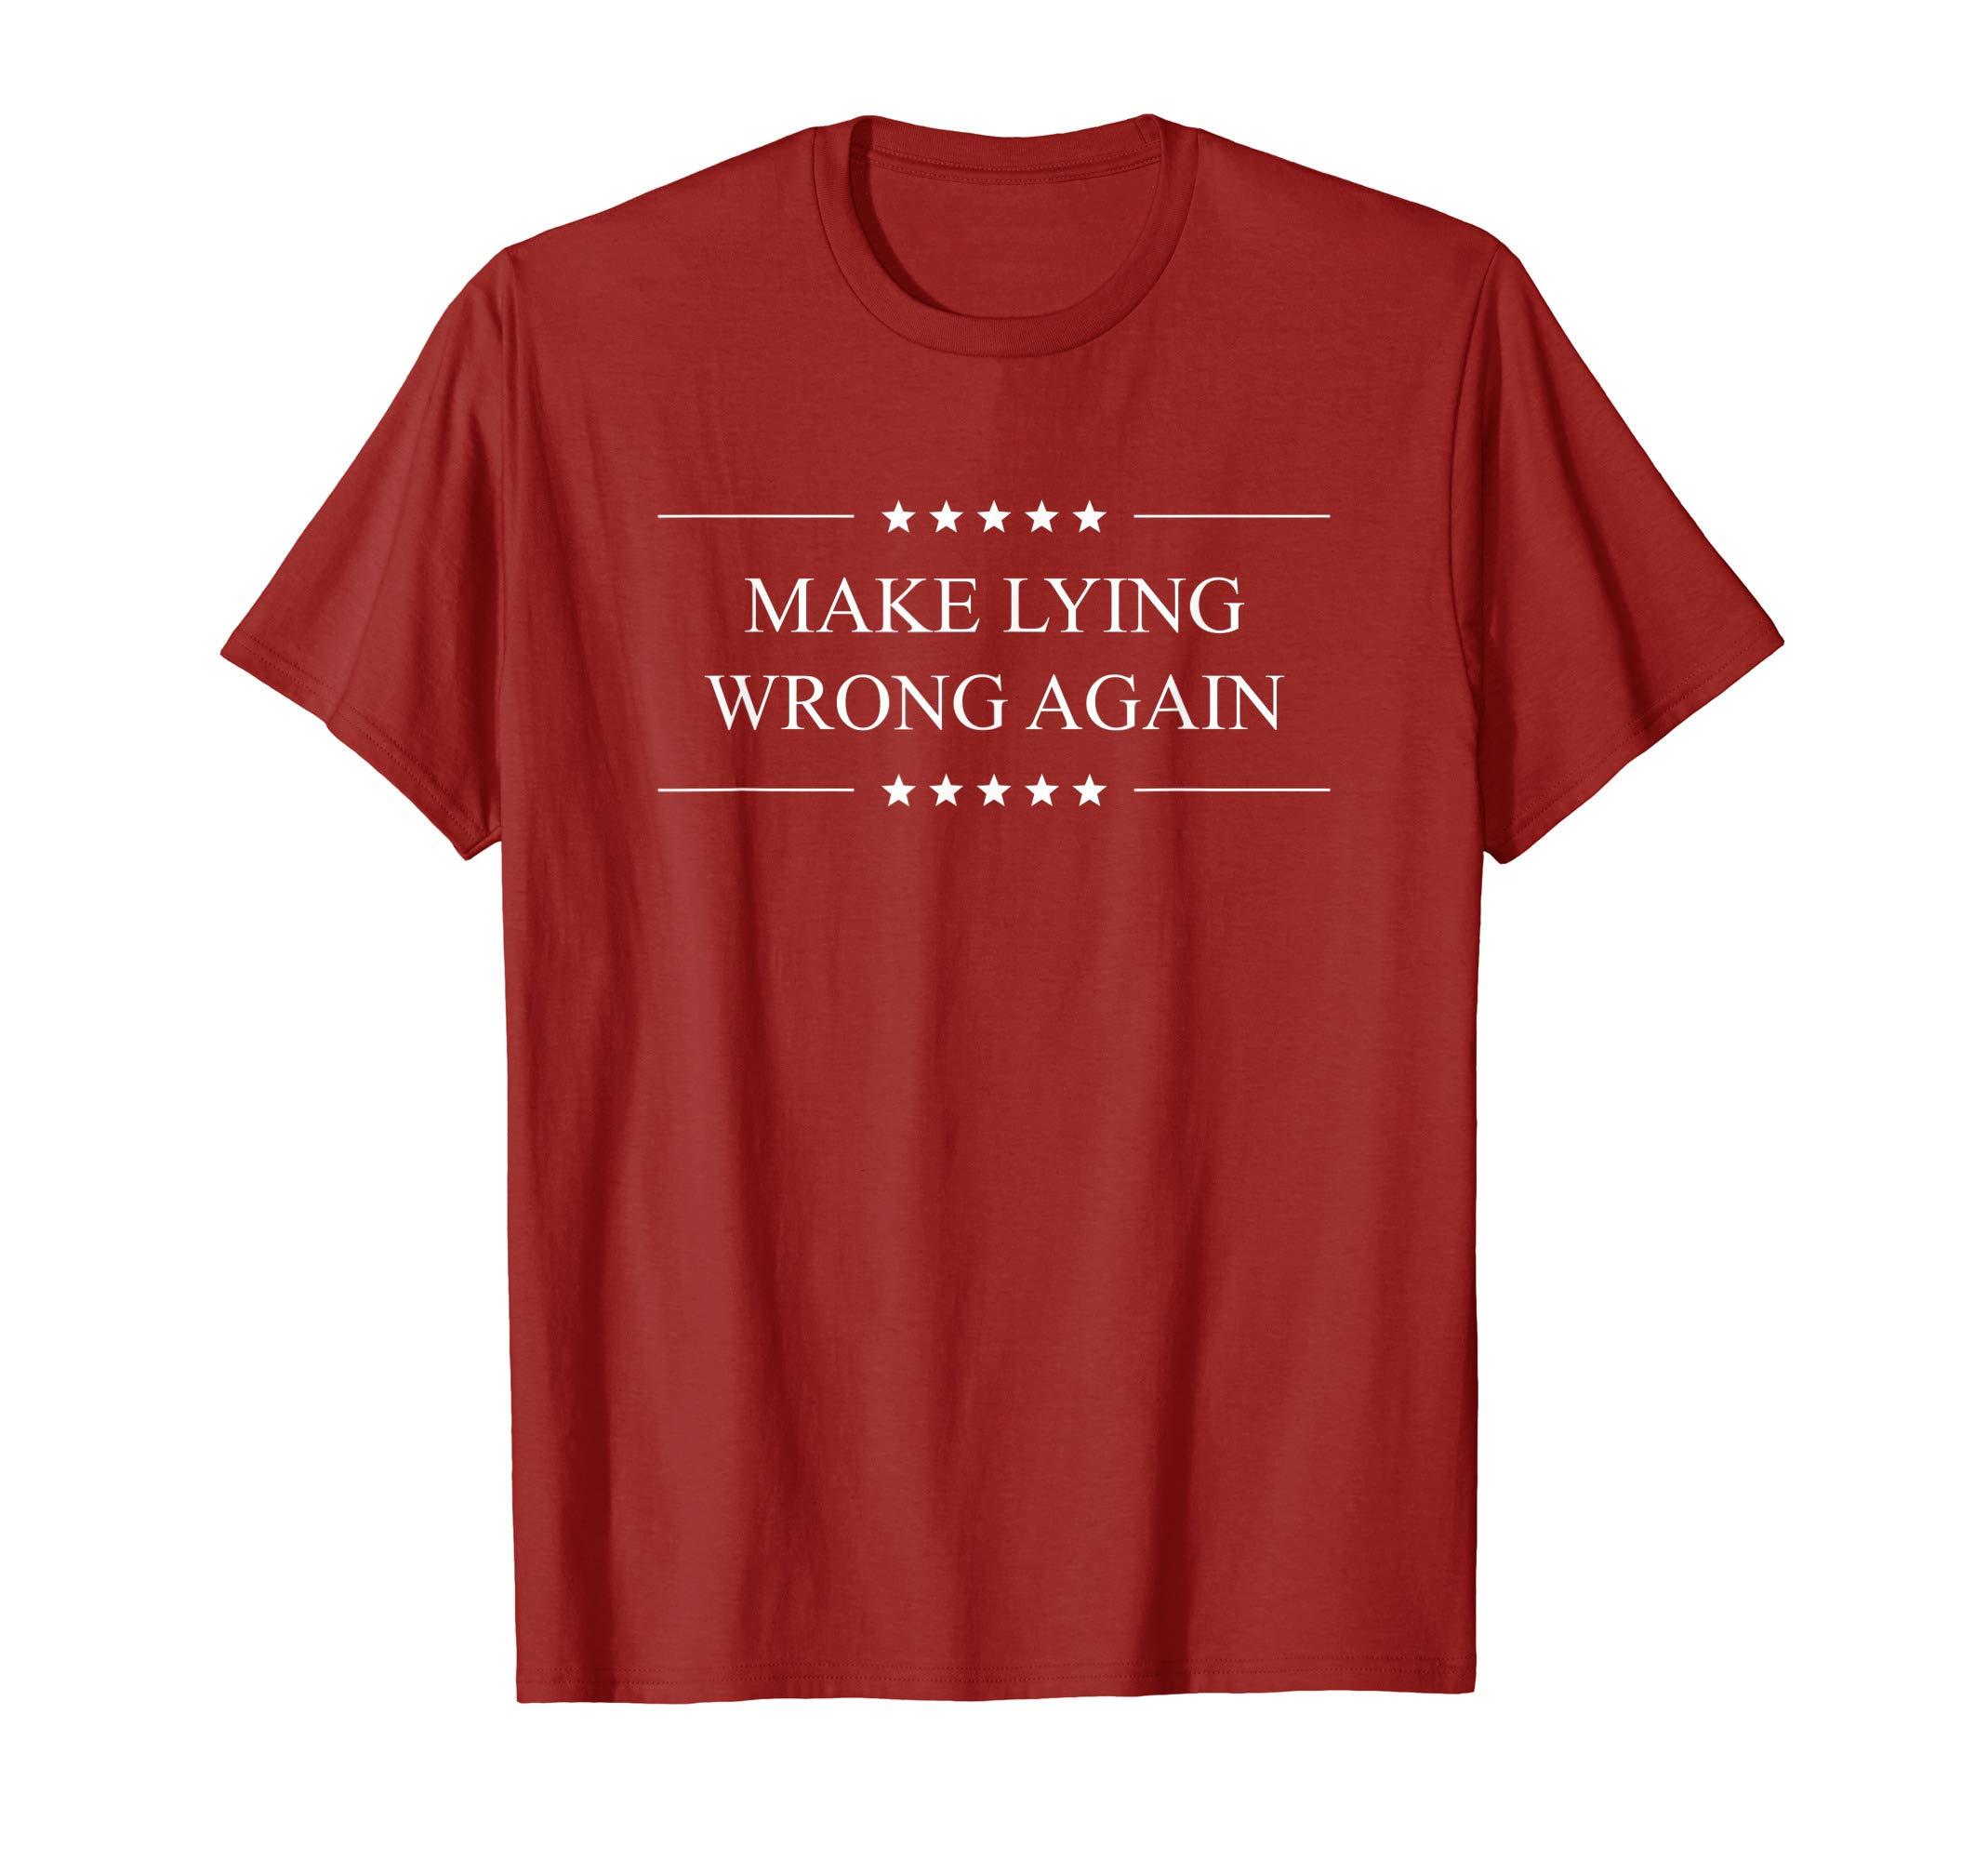 Make-Lying-Wrong-Again-Anti-Trump-Political-T-Shirt